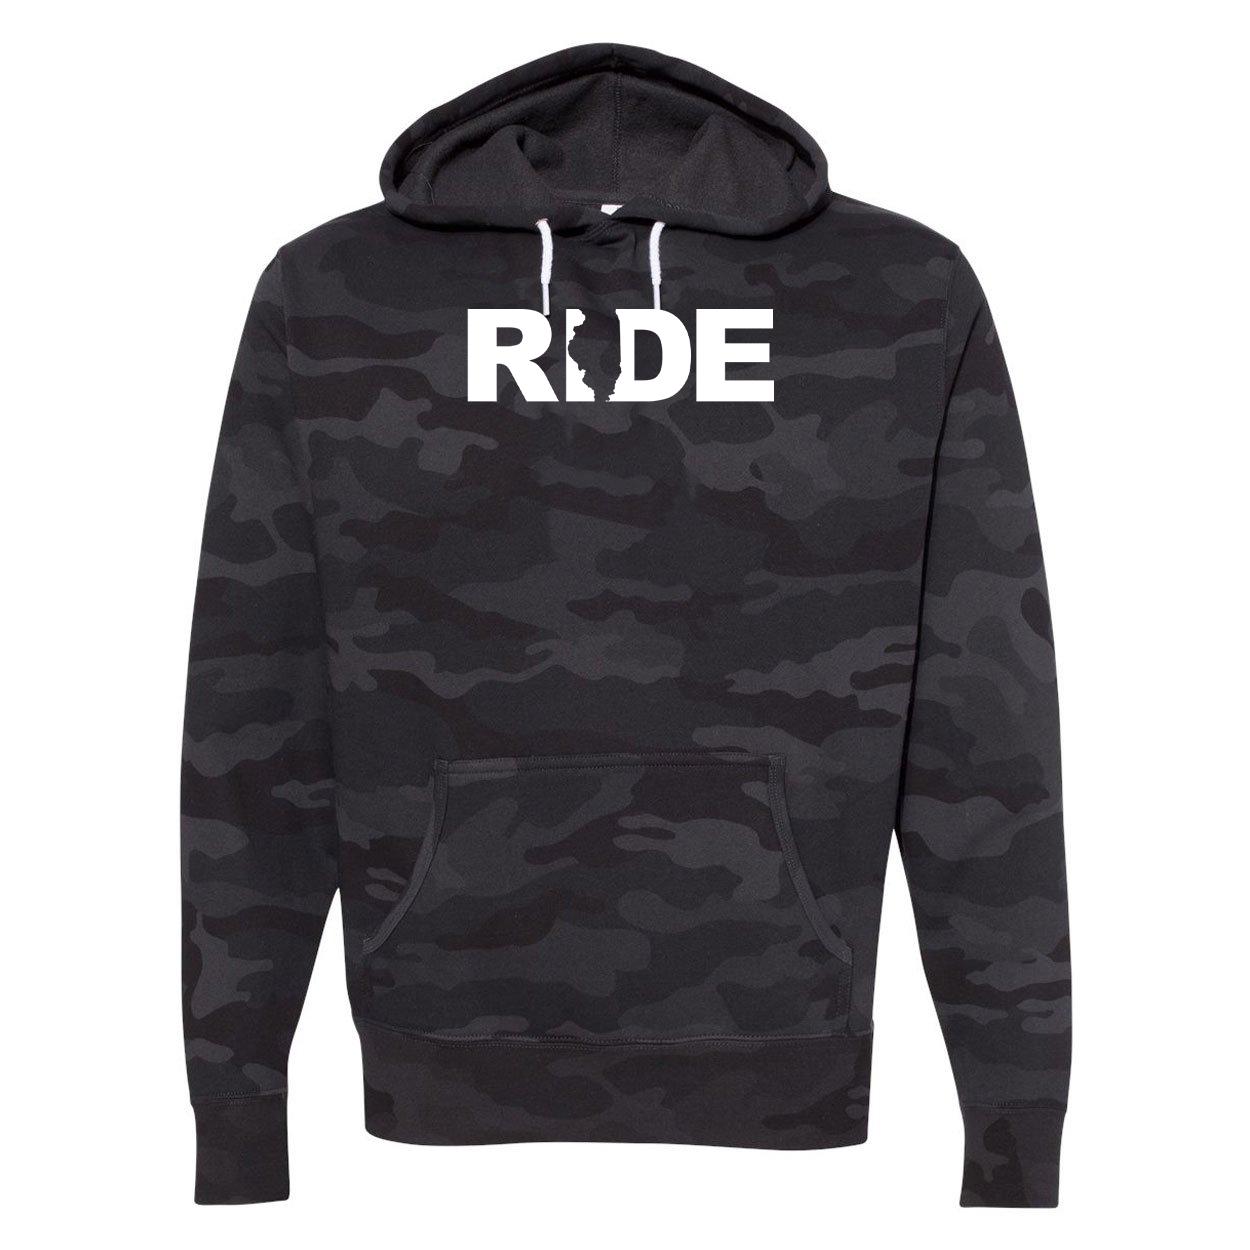 Ride Illinois Classic Unisex Hooded Sweatshirt Black Camo (White Logo)